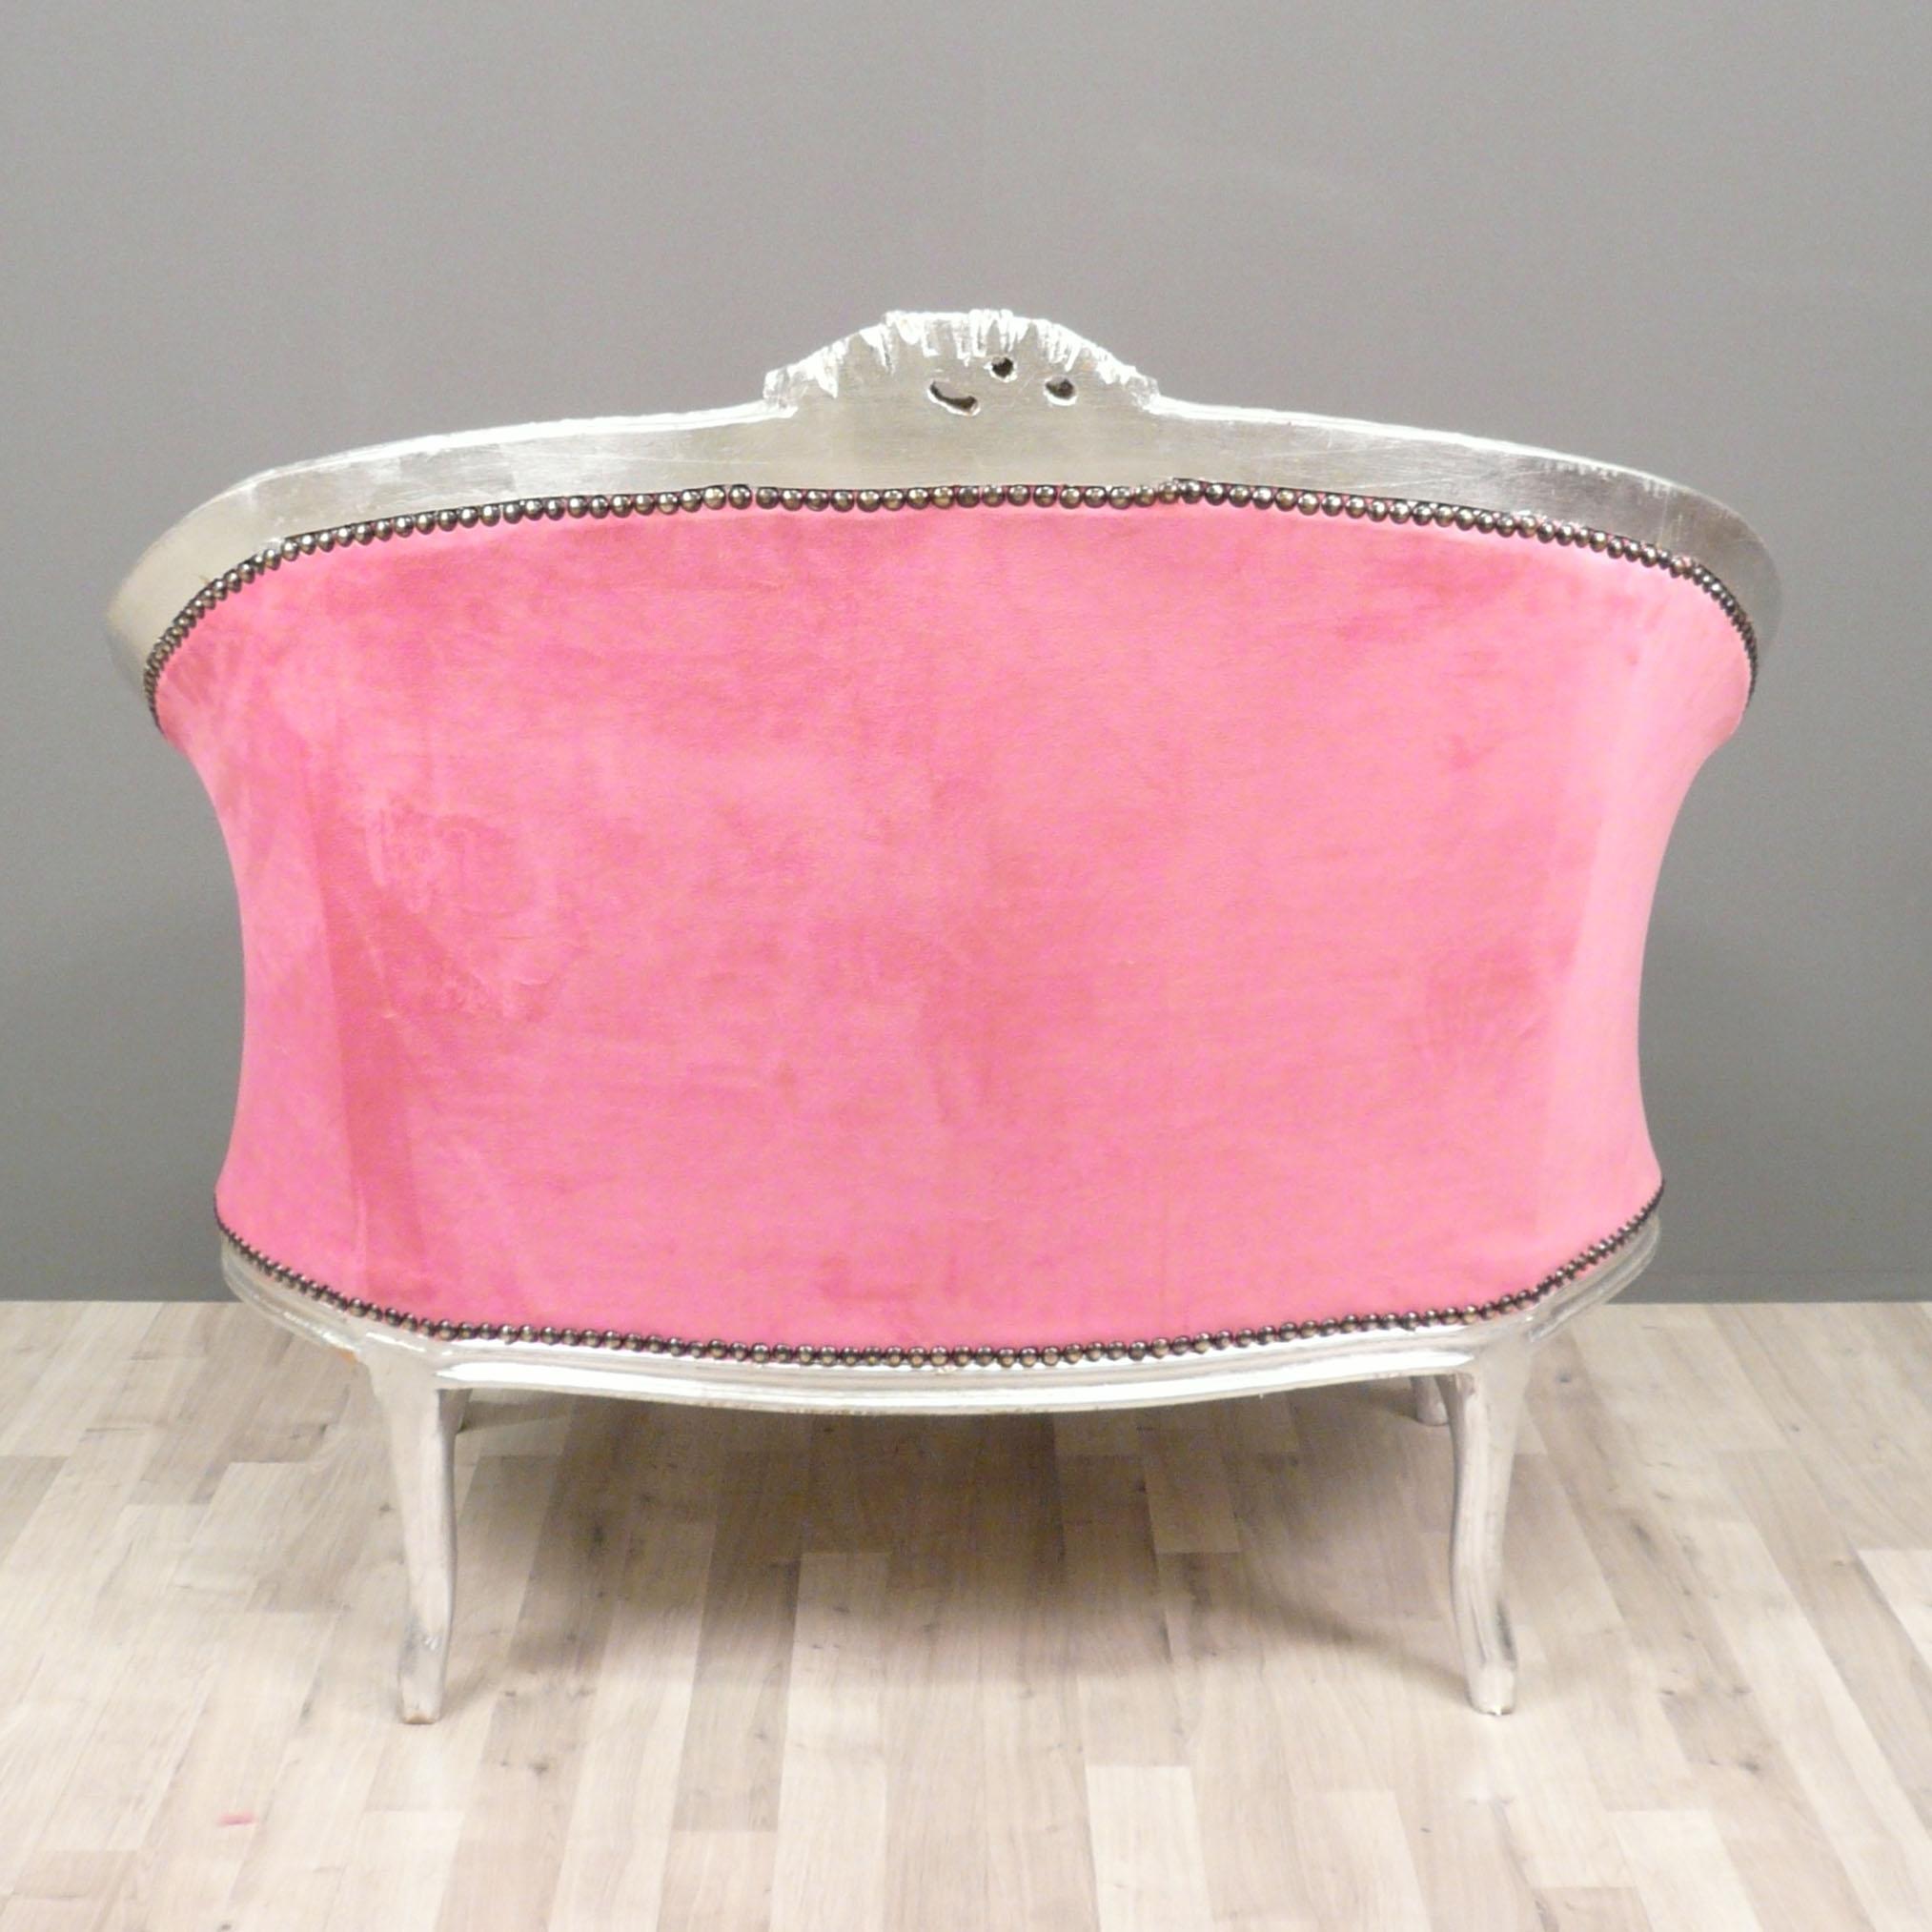 Canap baroque rose fauteuils baroques chaises - Chaise pour chambre adulte ...